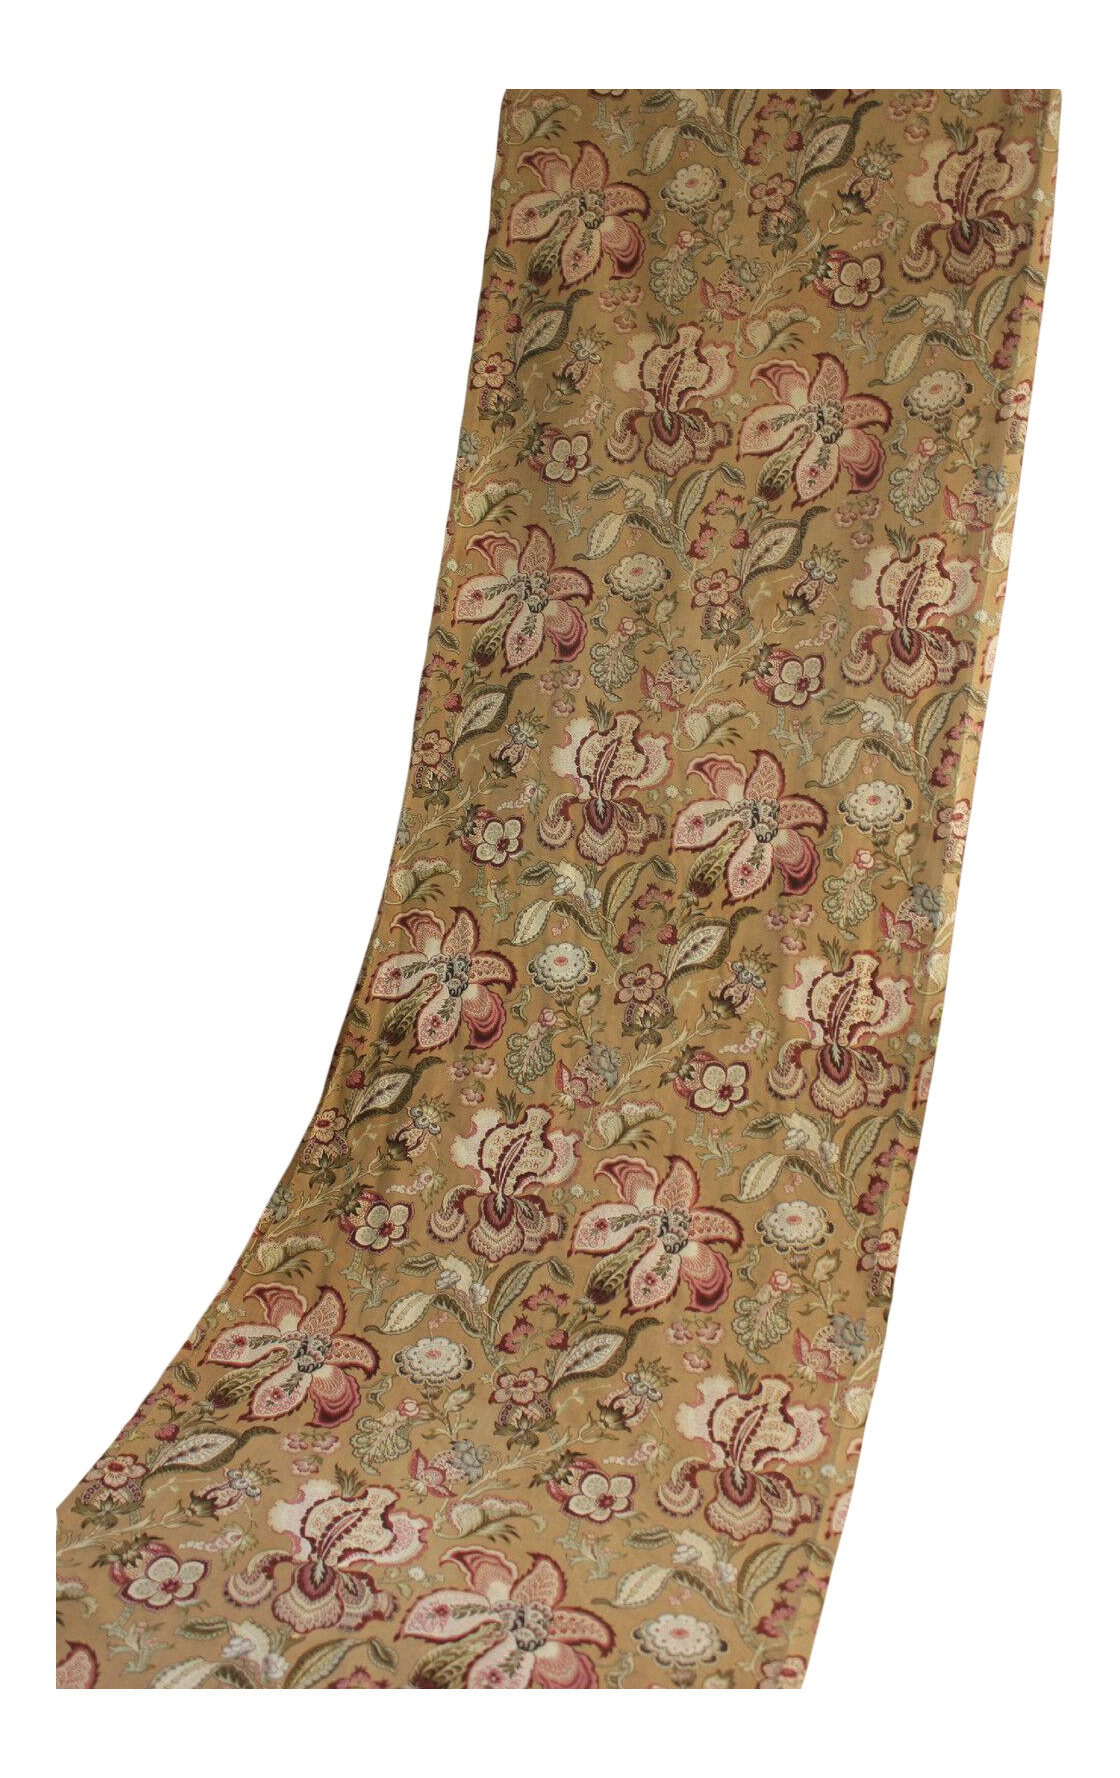 c1870 pink printed French fabric STUNNING pattern